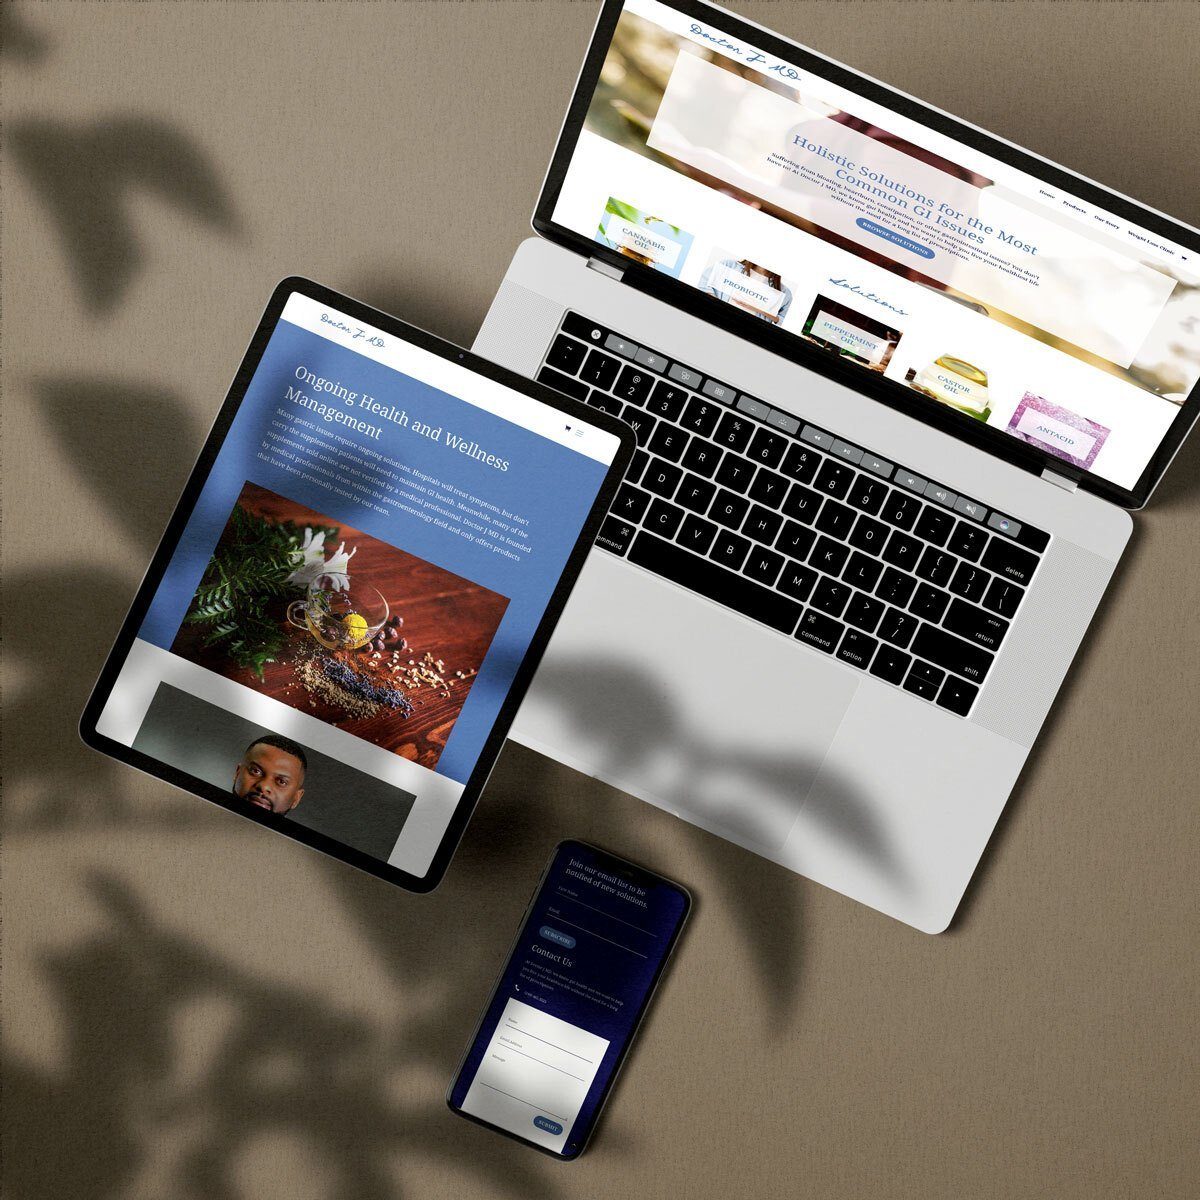 Doctor J MD Web Design by BrandSwan, a web design company